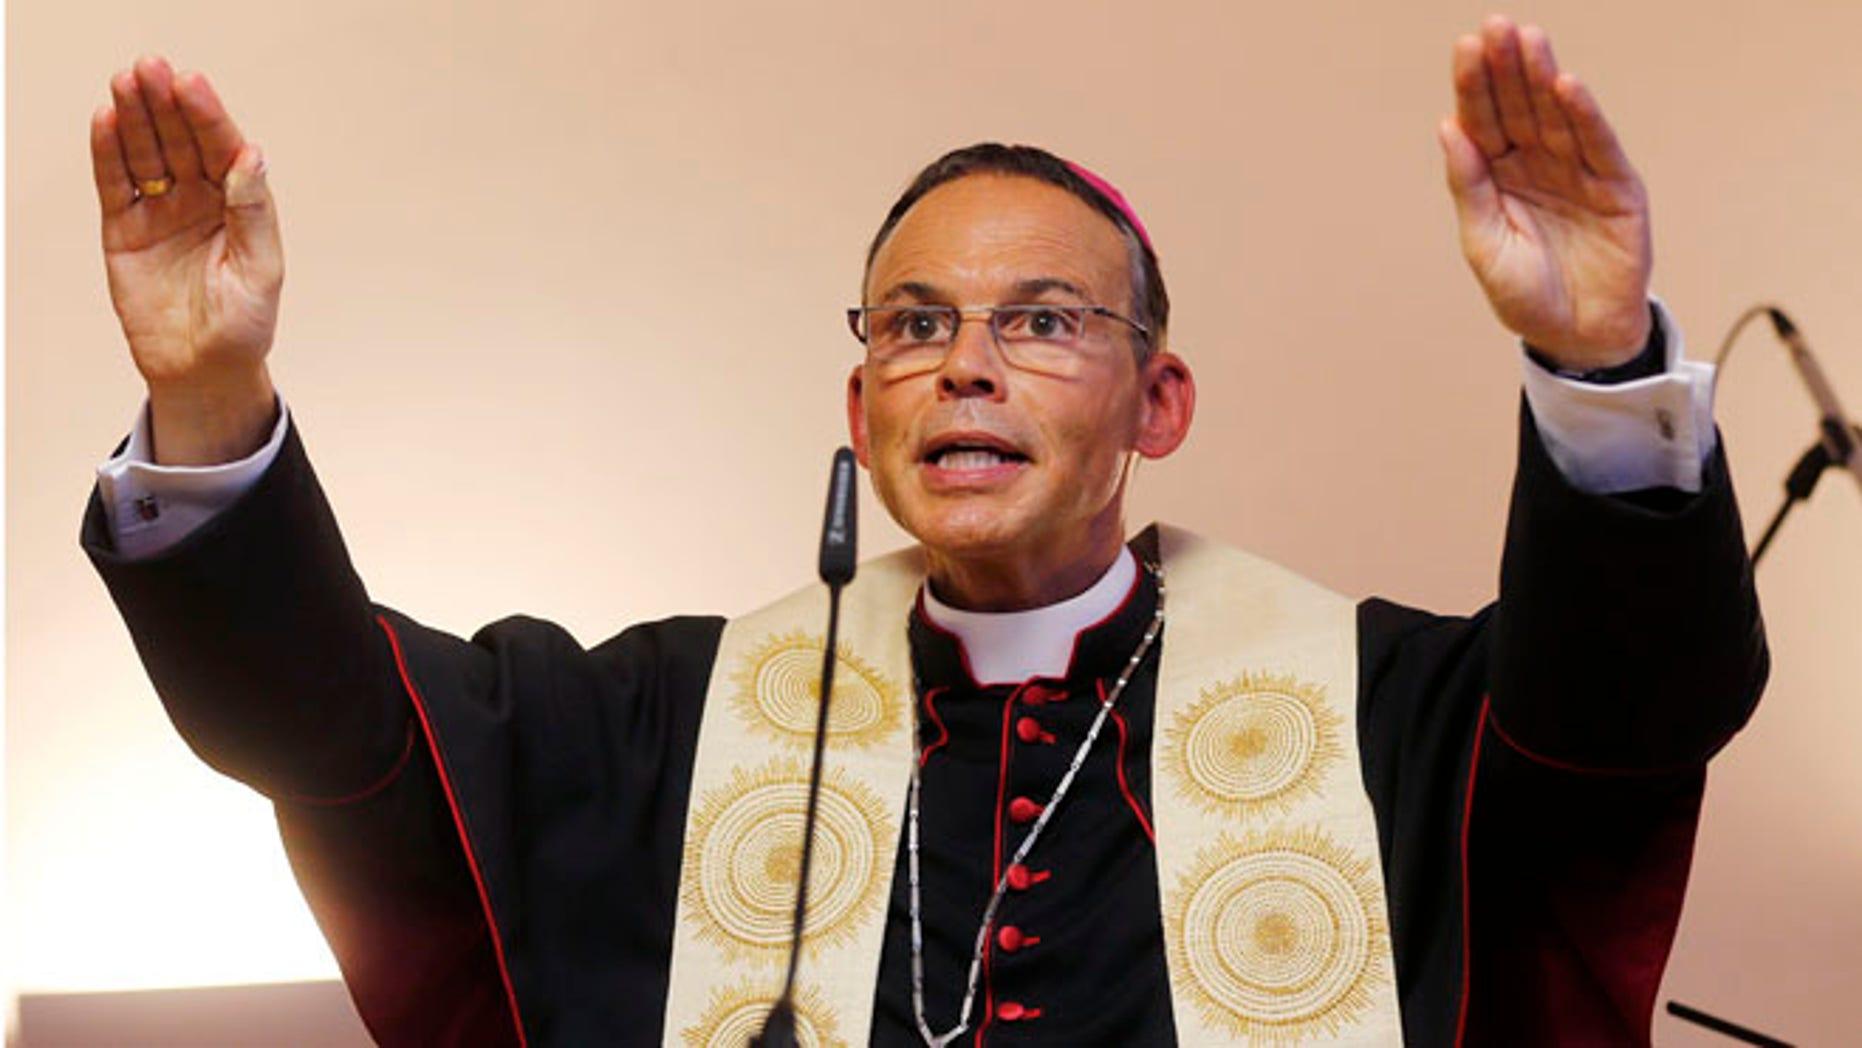 Aug. 29, 2013: In this file photo the Bishop of Limburg Franz-Peter Tebartz-van Elst blesses a new Kindergarten in Frankfurt, Germany.